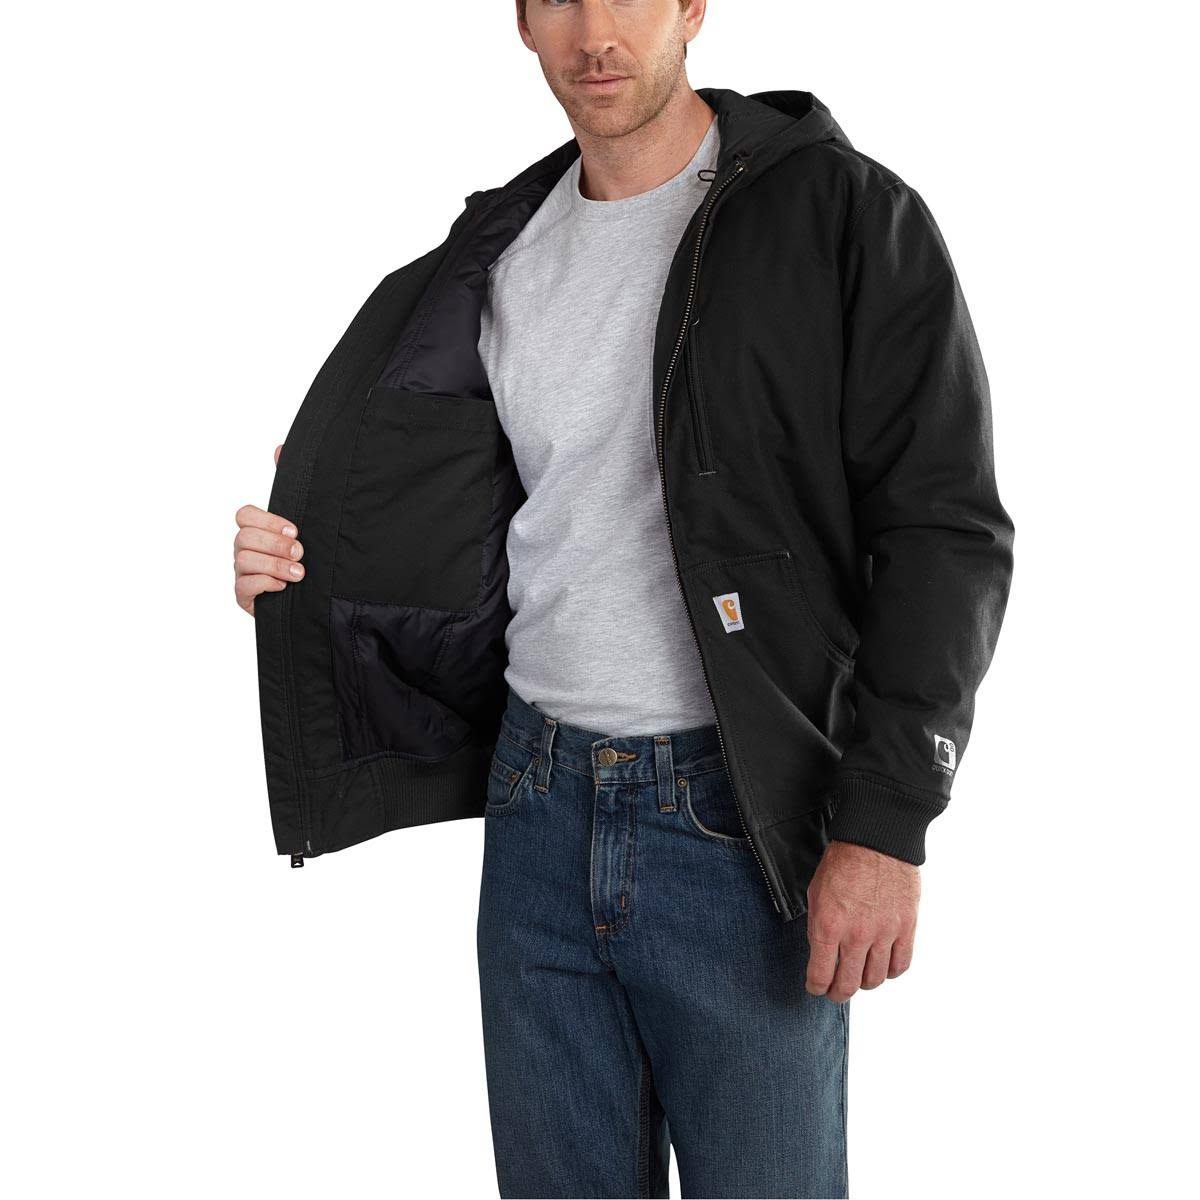 com Carhartt Jacket Duck 101493 Quick Midwestworkwear Active Jefferson qrqgfnZv